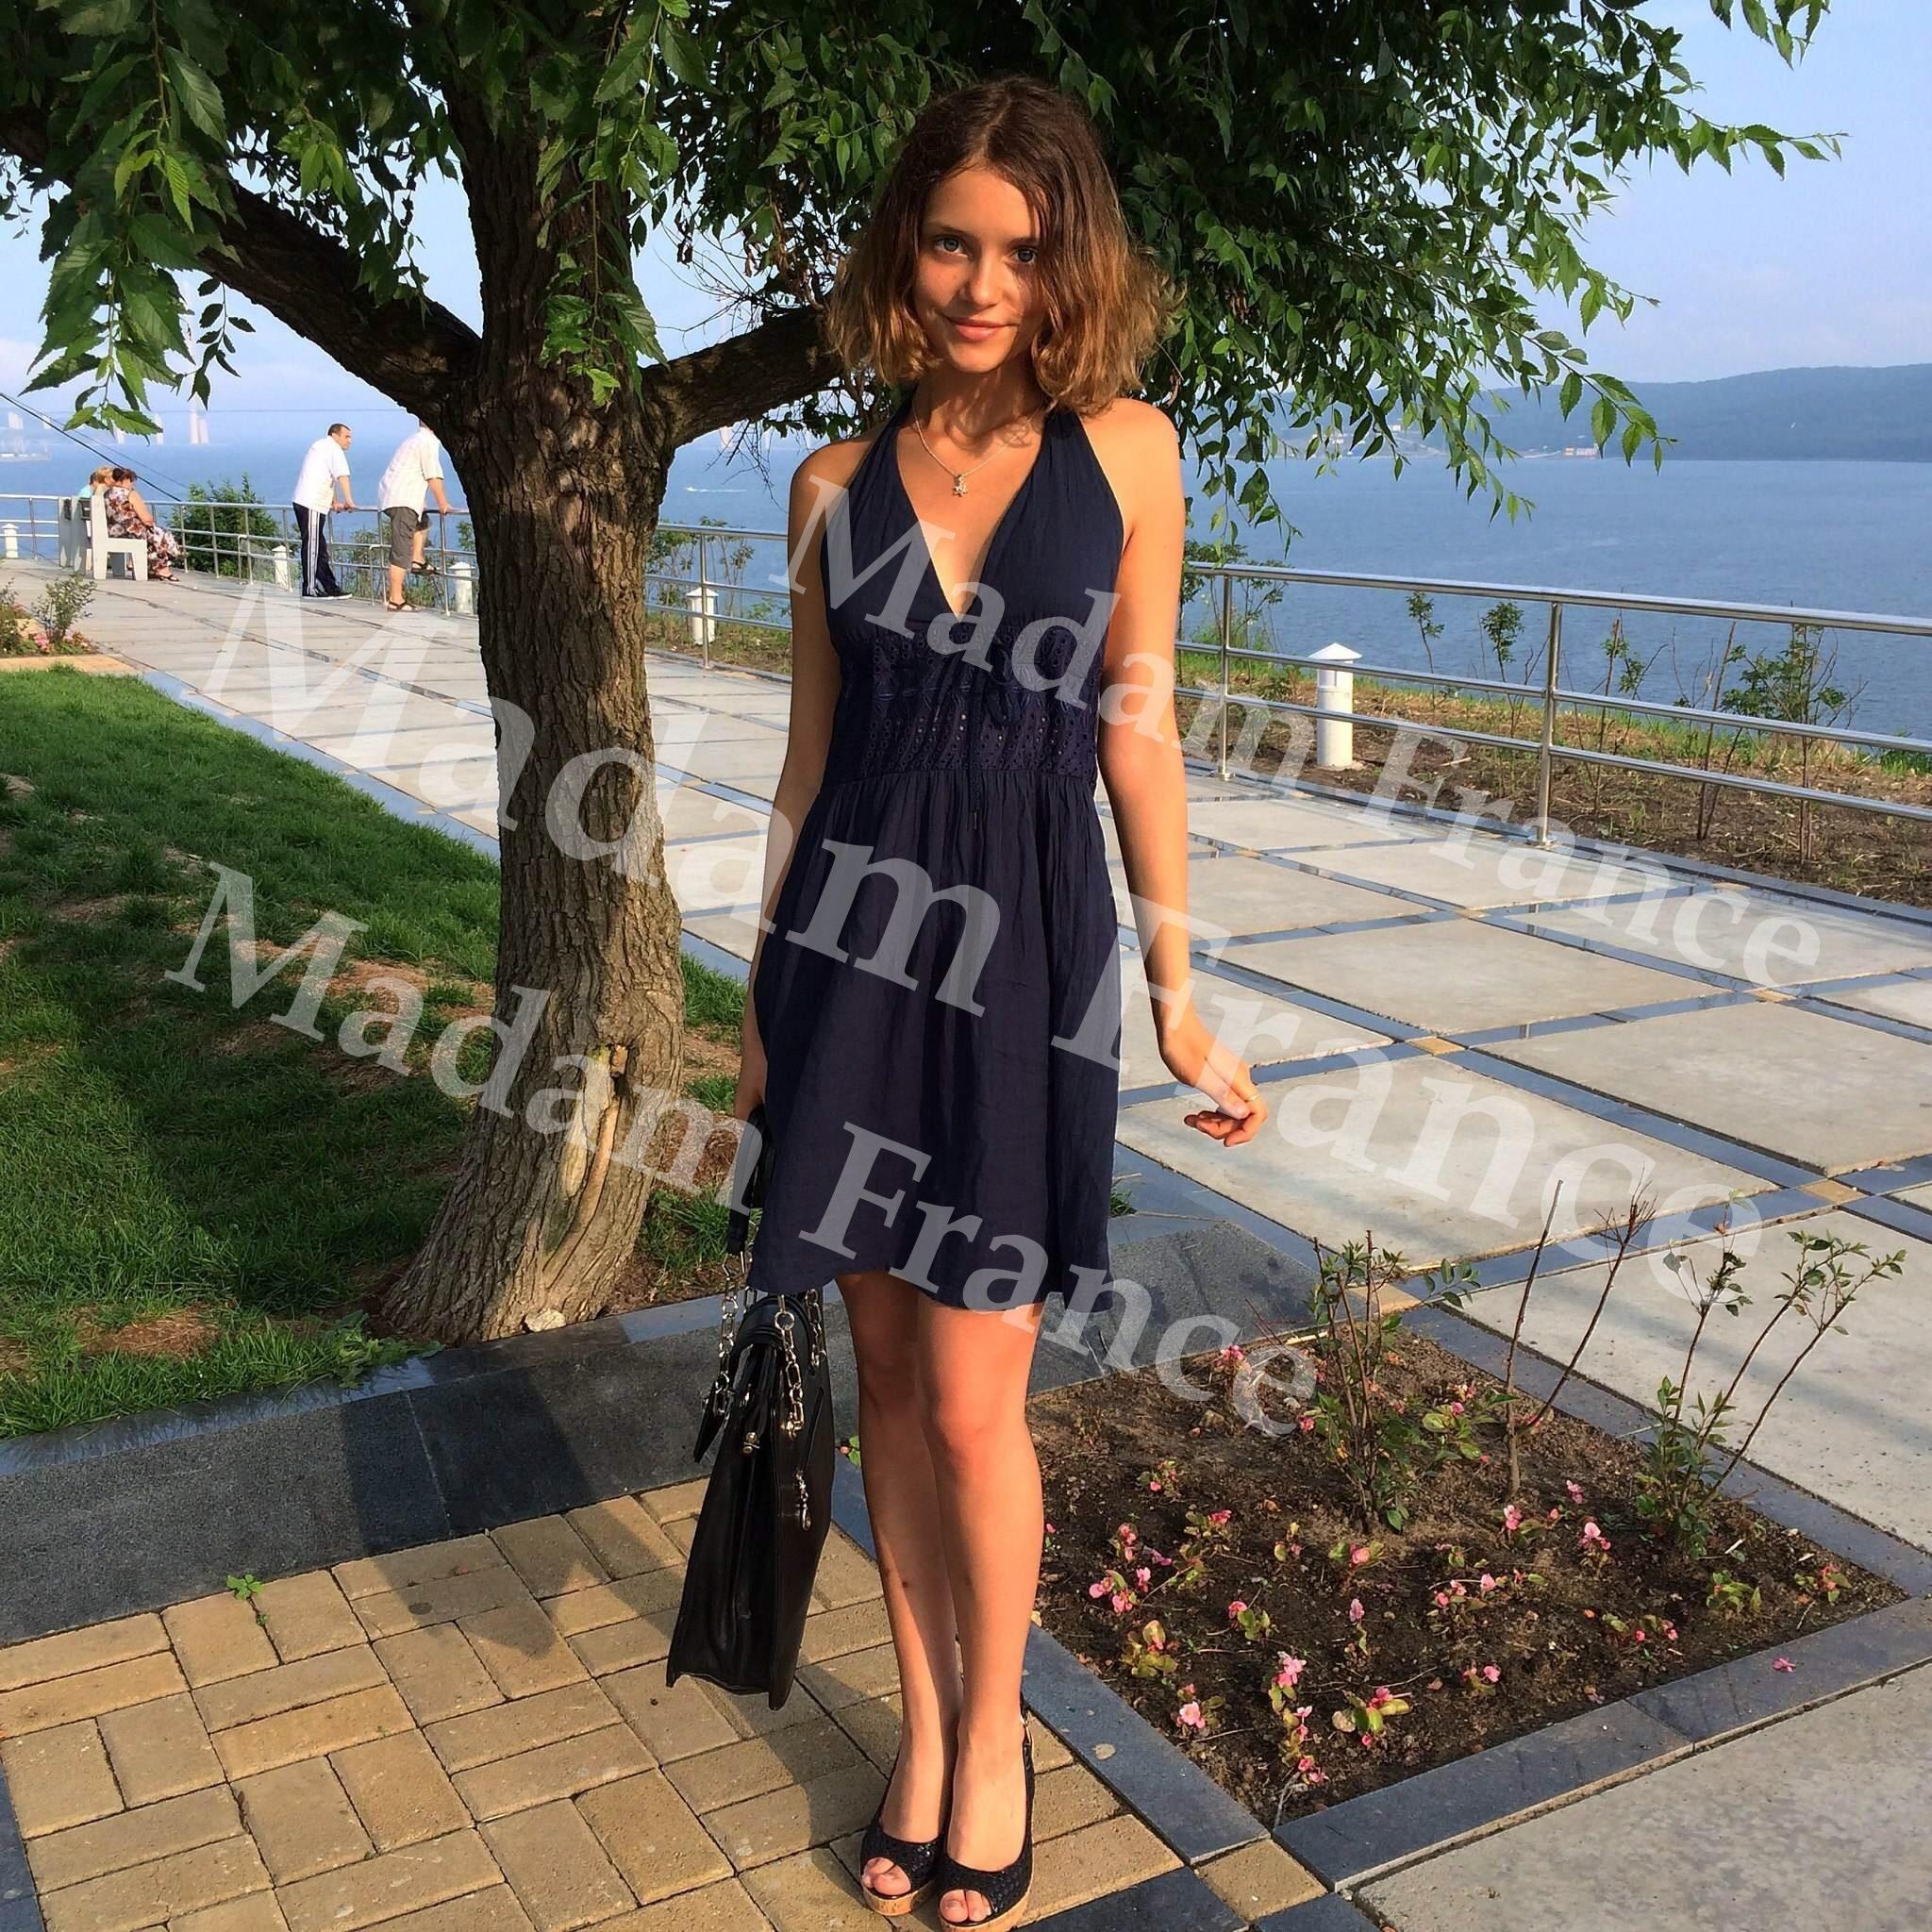 Karina model on Madam France escort service